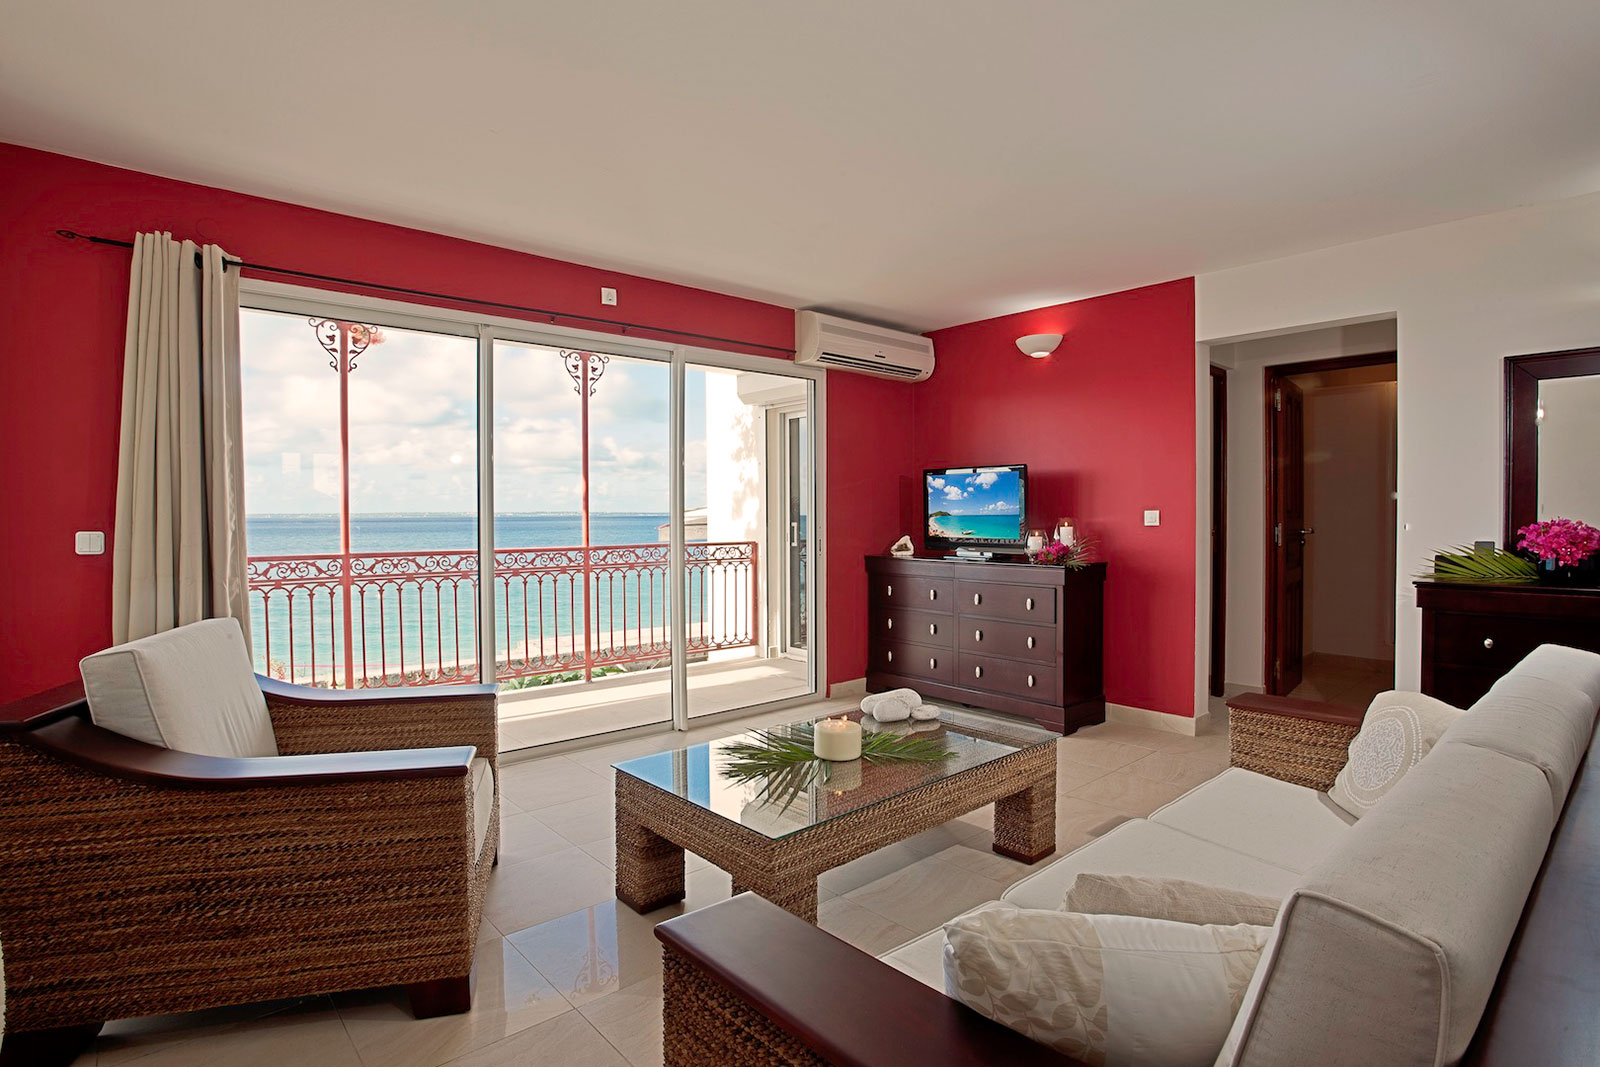 Saint martin location appartement 2 chambres sur la plage ti 39 calypso saint martin for Un salon de luxe